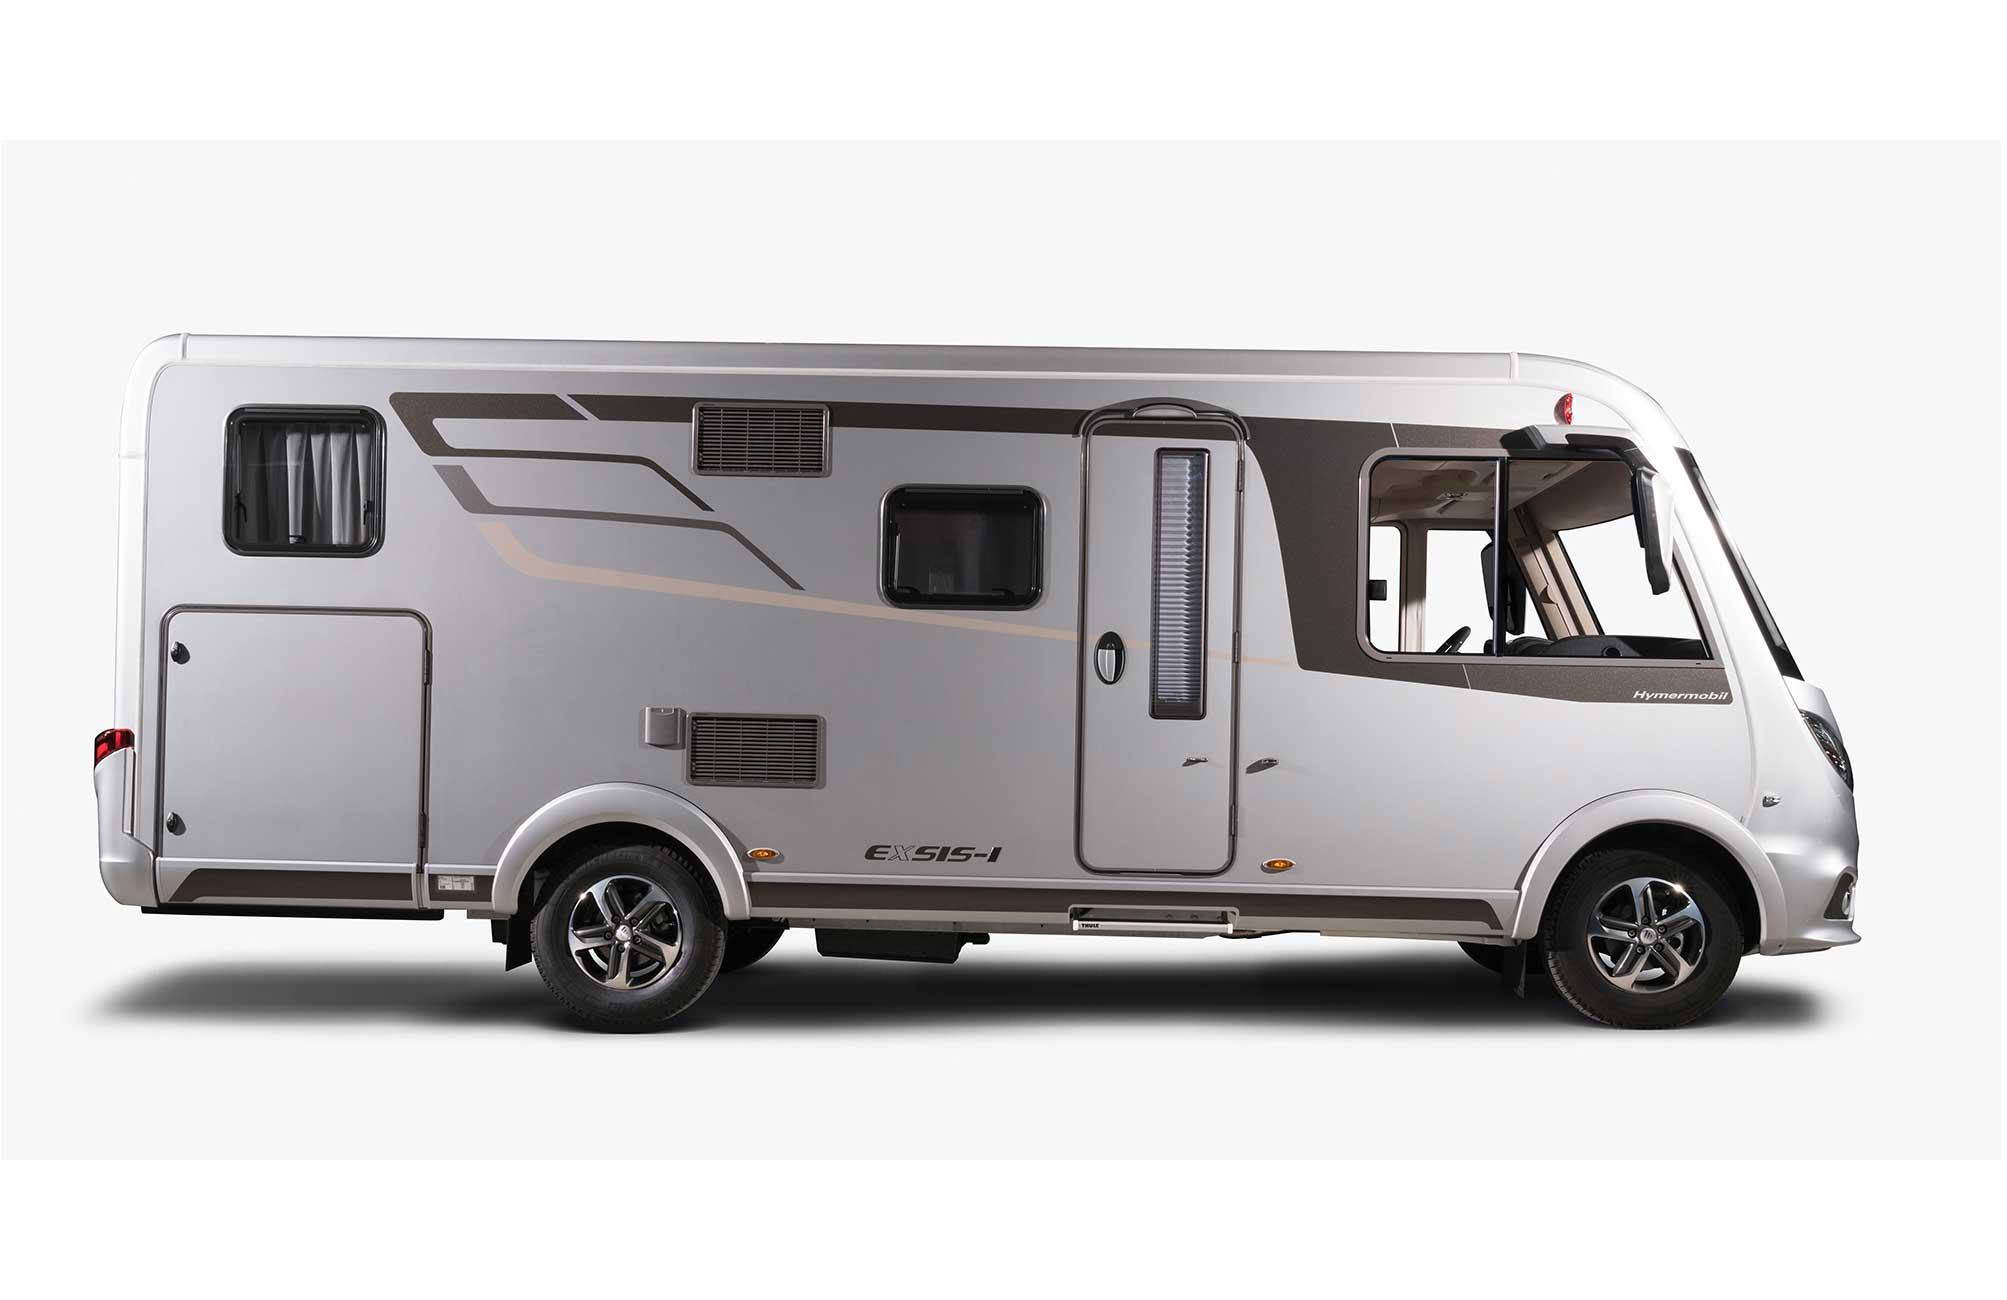 Caravan Zonder Badkamer : Van drogen campers & caravans hymer exsis i